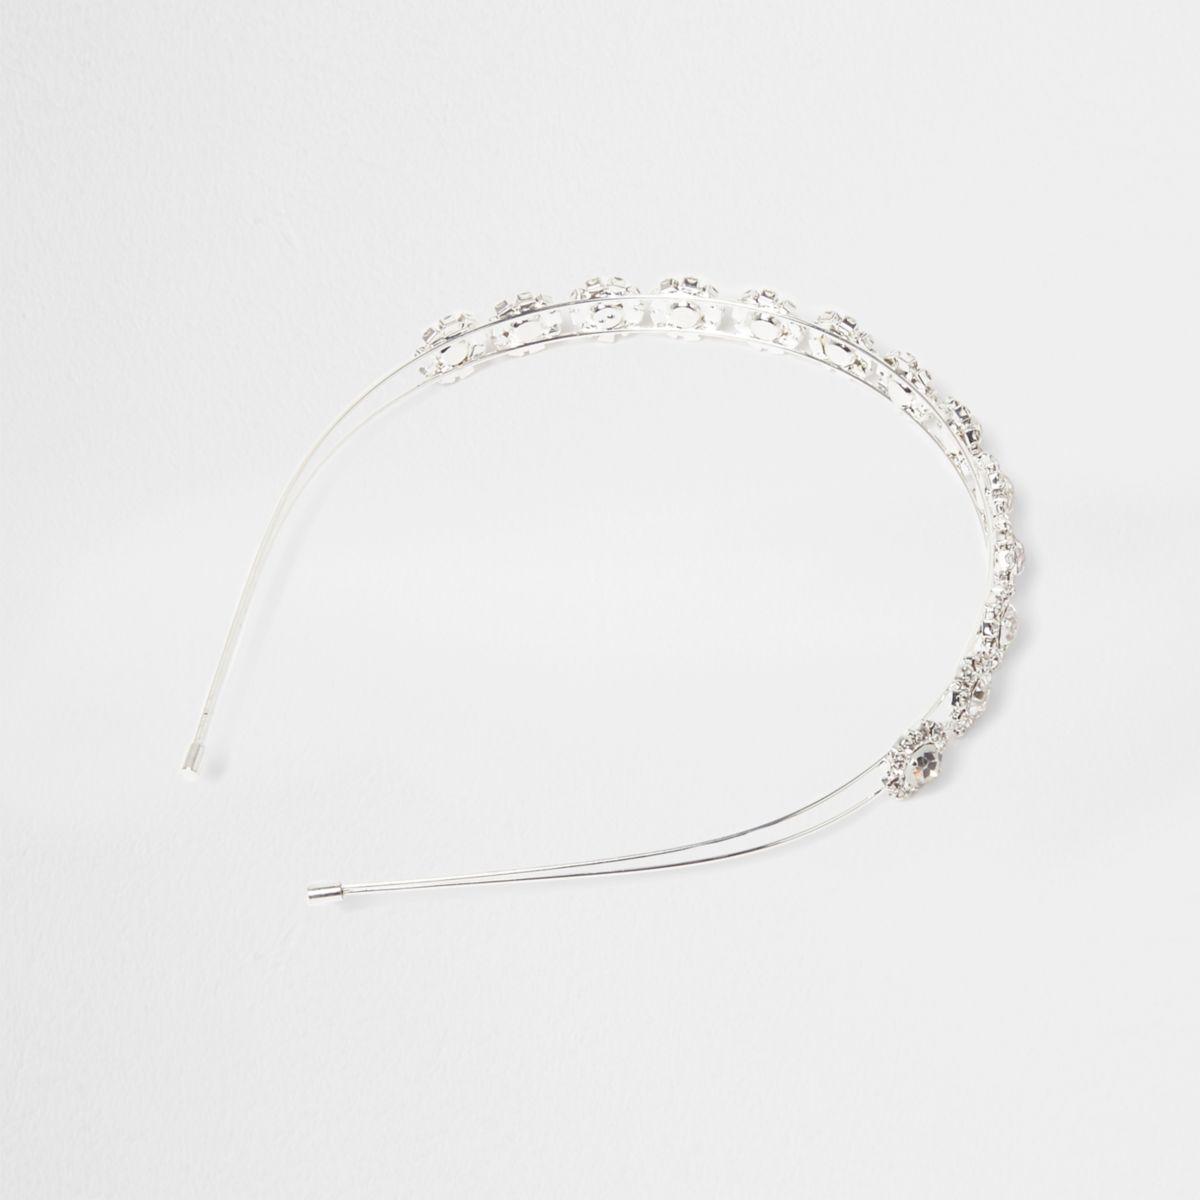 Silver tone rhinestone flower hair band